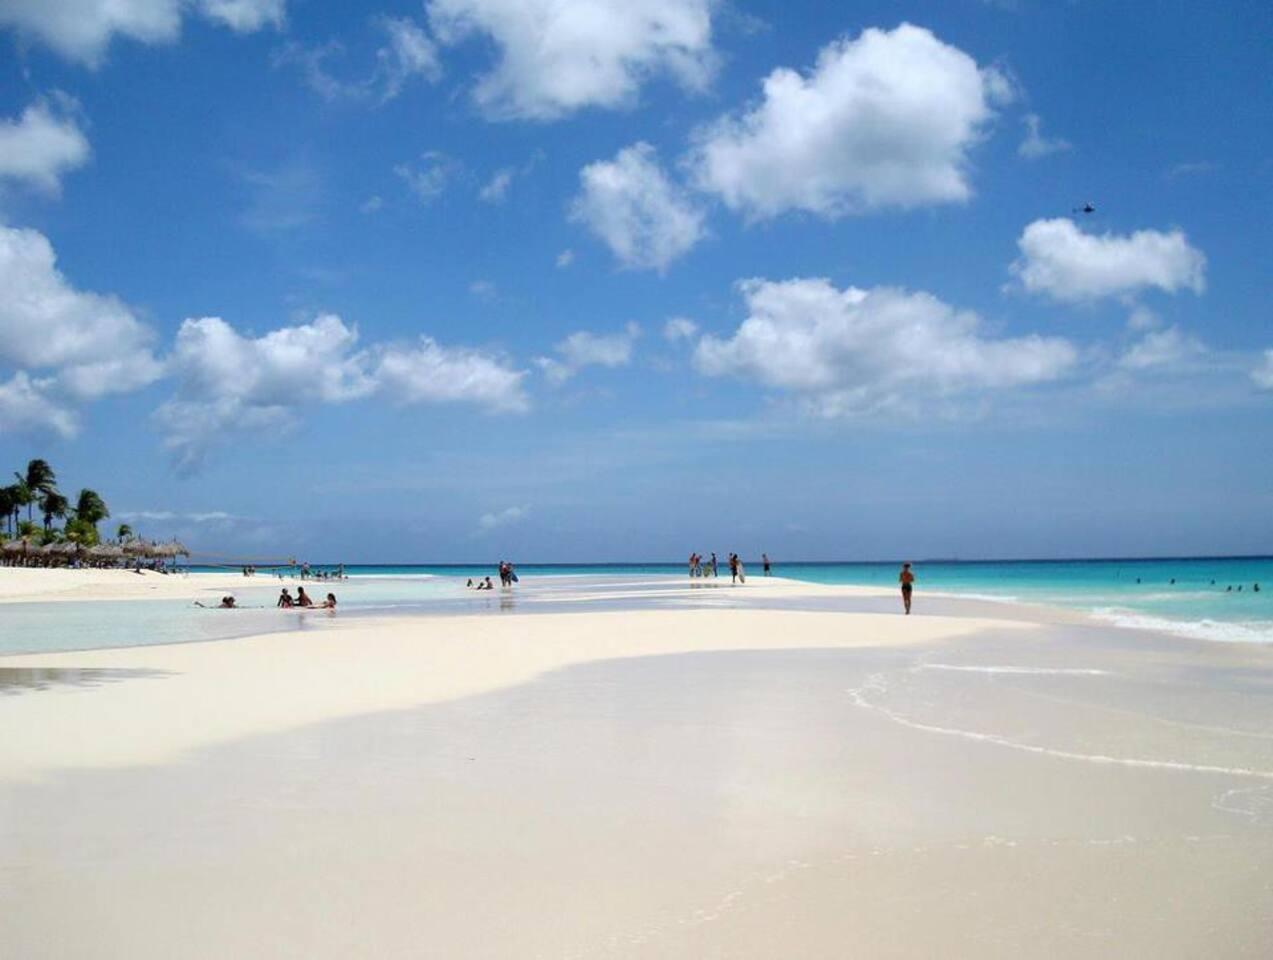 Eagle Beach!..  Rated as the BEST beach in Aruba by TripAdvisor & USA Today.  Not to shabby :)